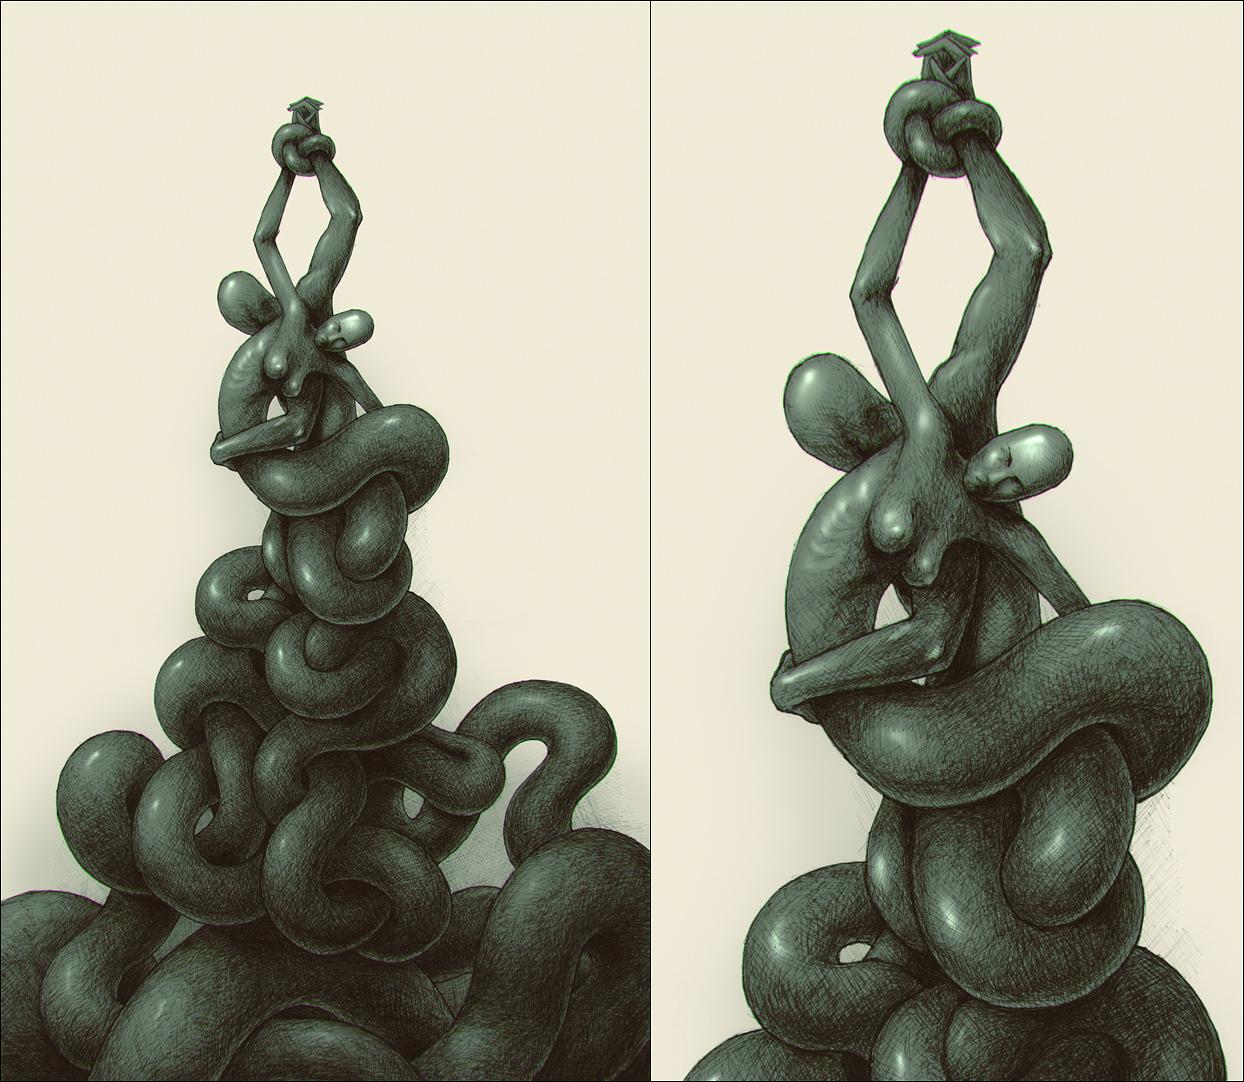 Homunculi by NegativeFeedback